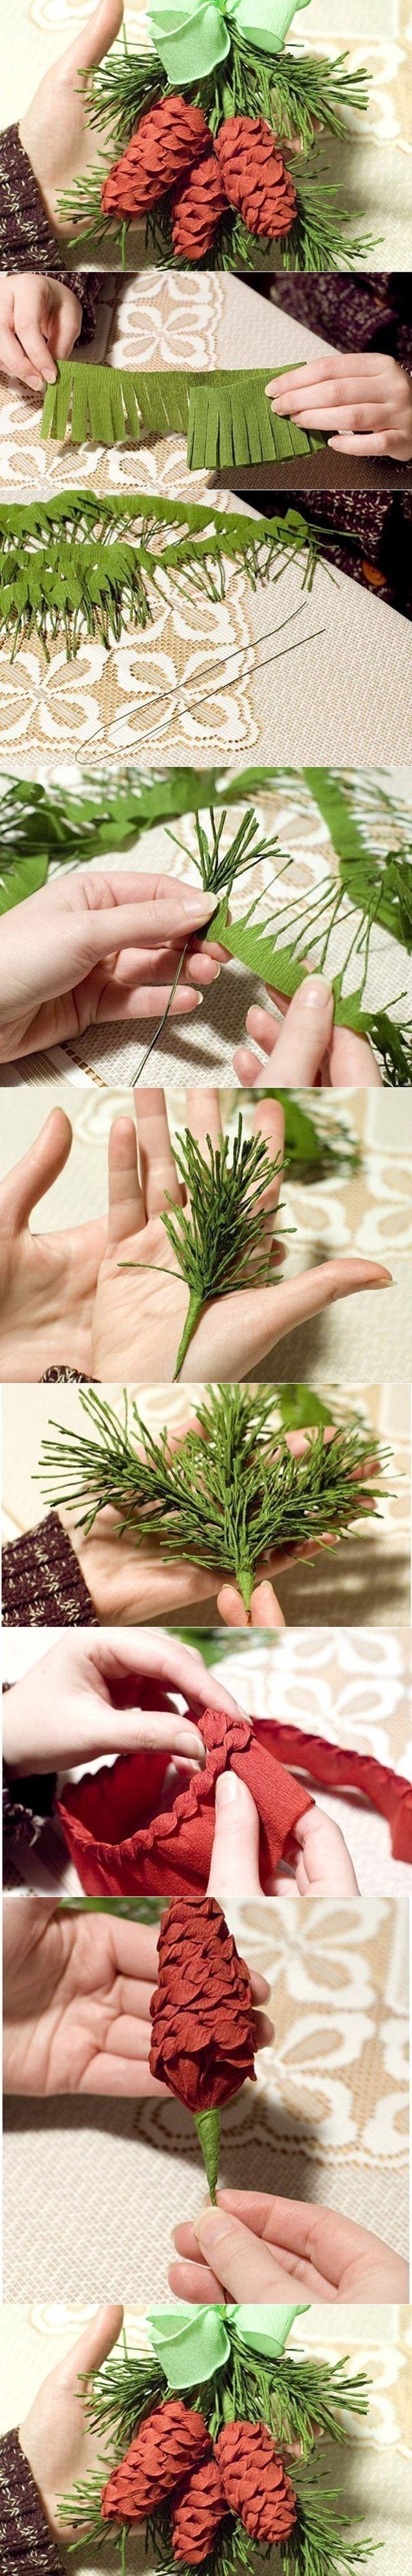 DIY Crepe Paper Pine Cone with Fir Leaf | www.FabArtDIY.com LIKE Us on Facebook ==> https://www.facebook.com/FabArtDIY